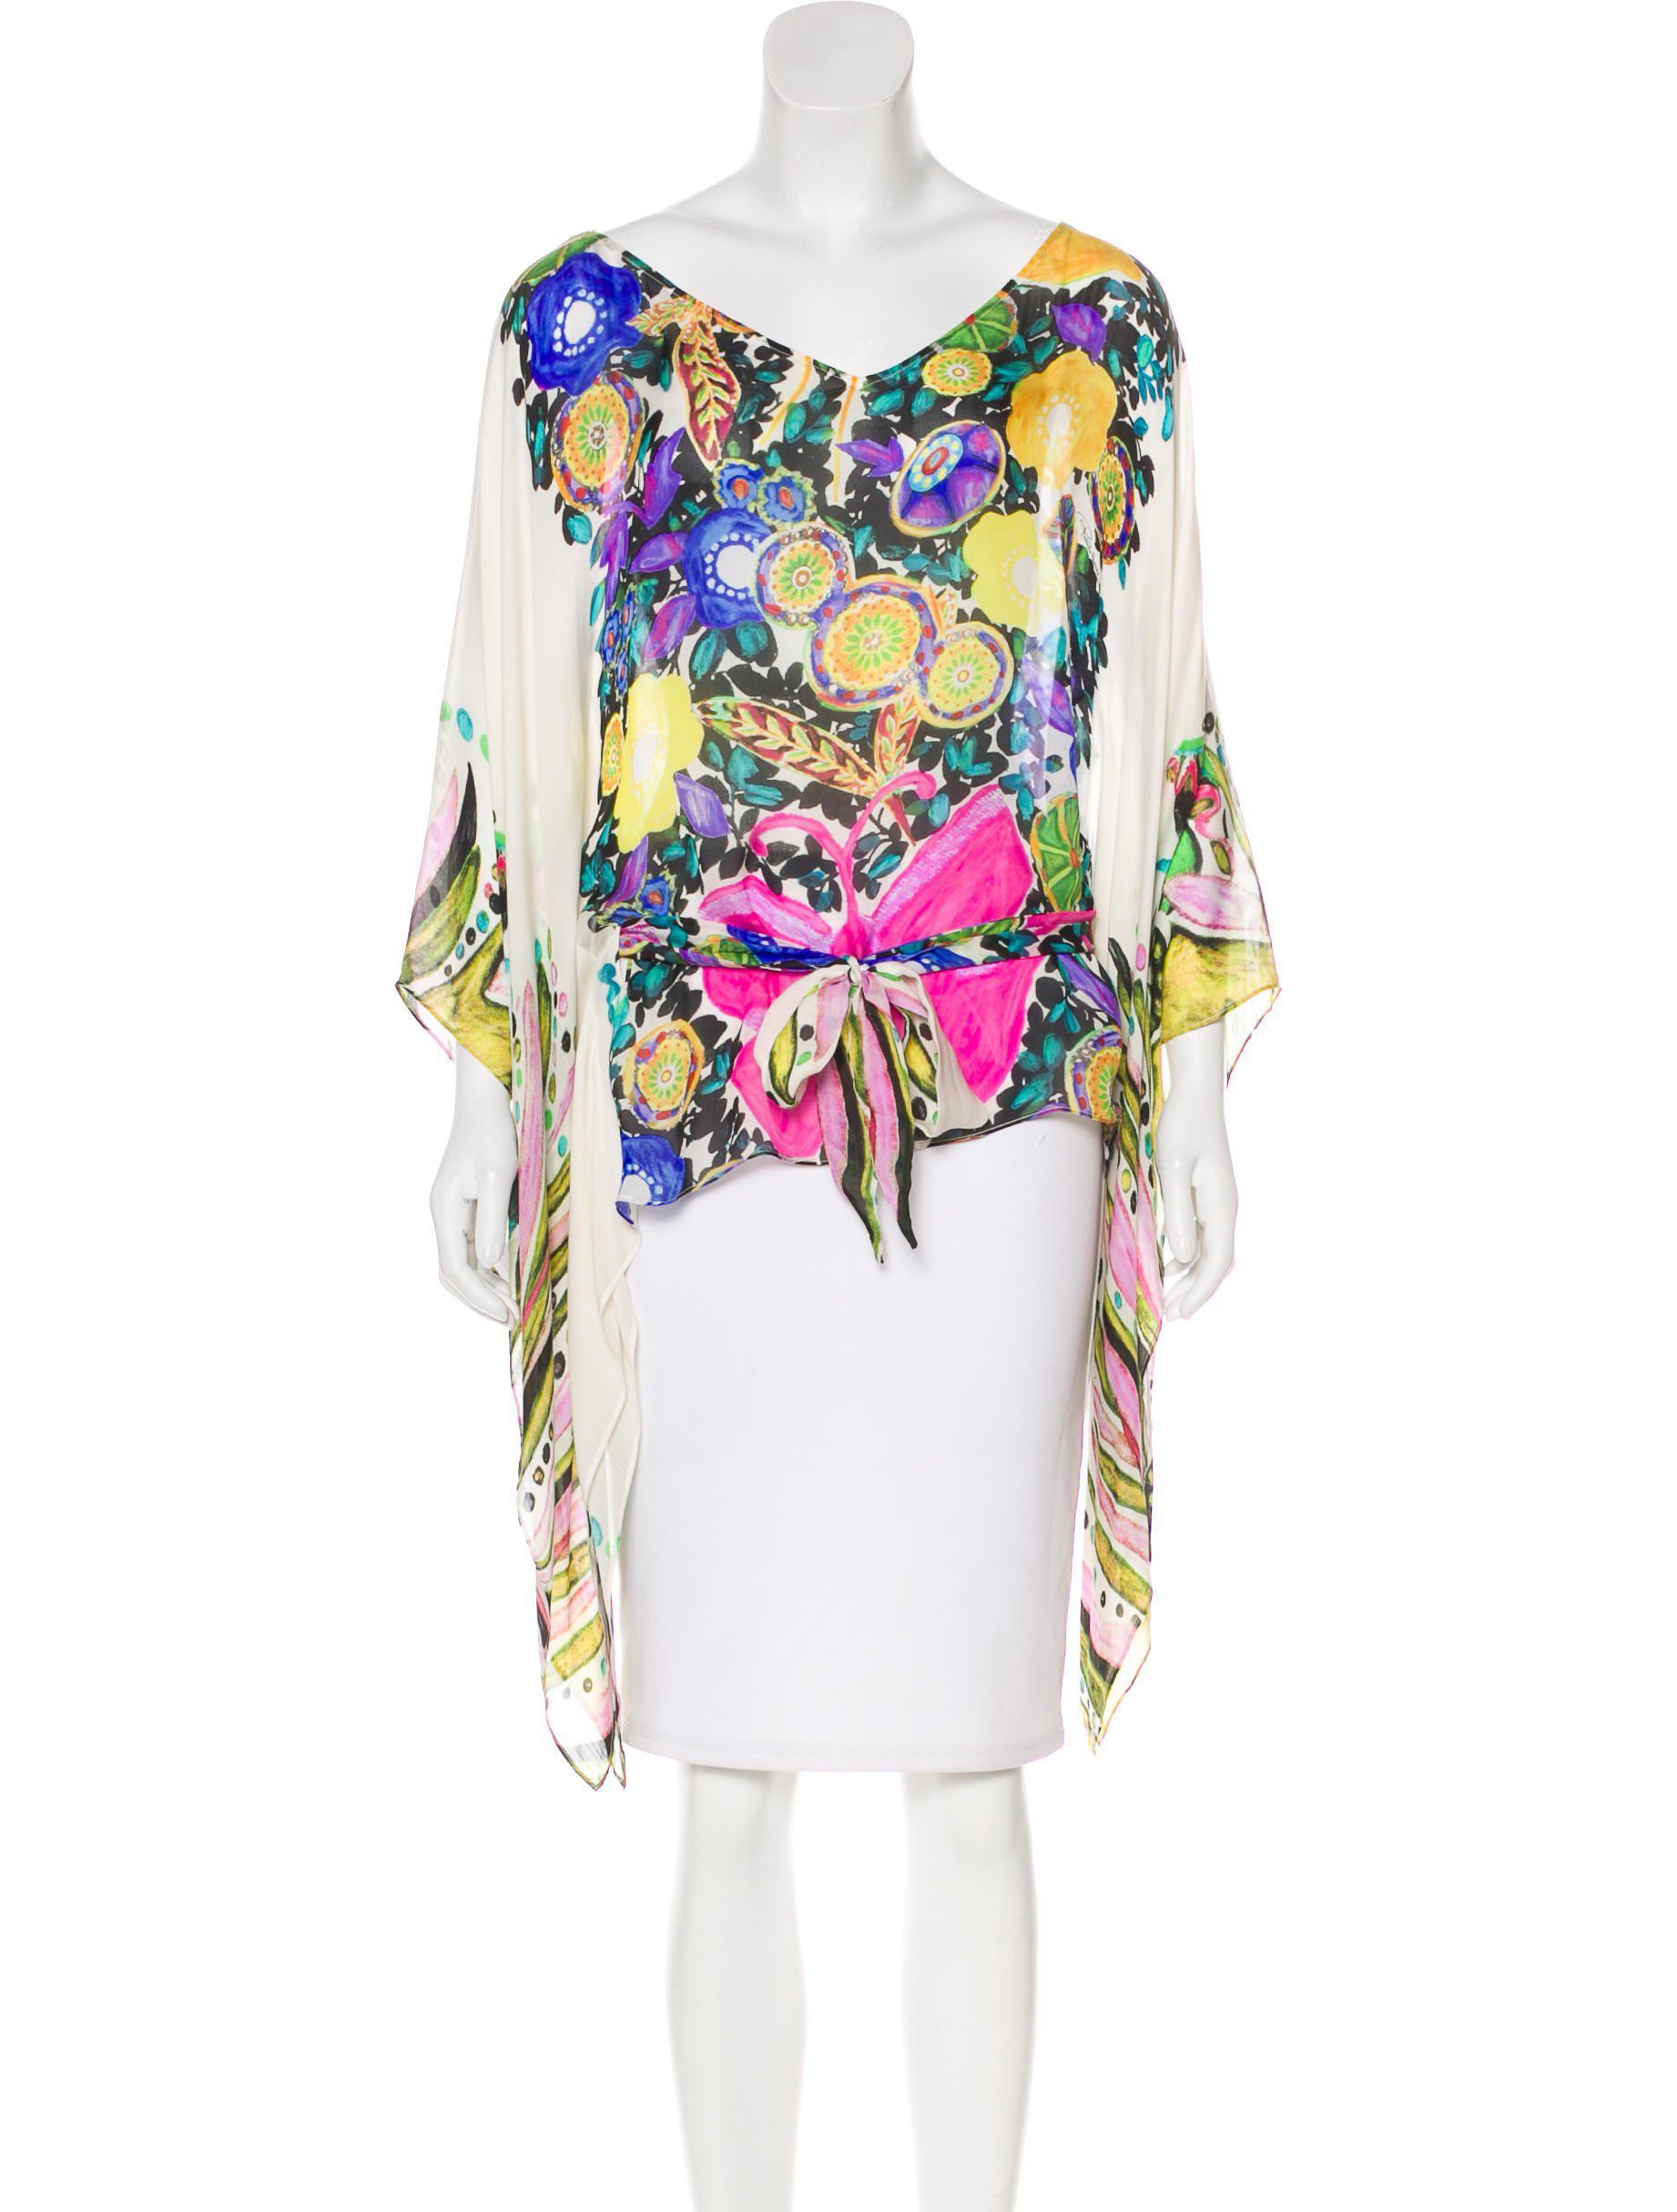 Roberto Cavalli. Women's Silk Abstract Print Blouse Multicolor